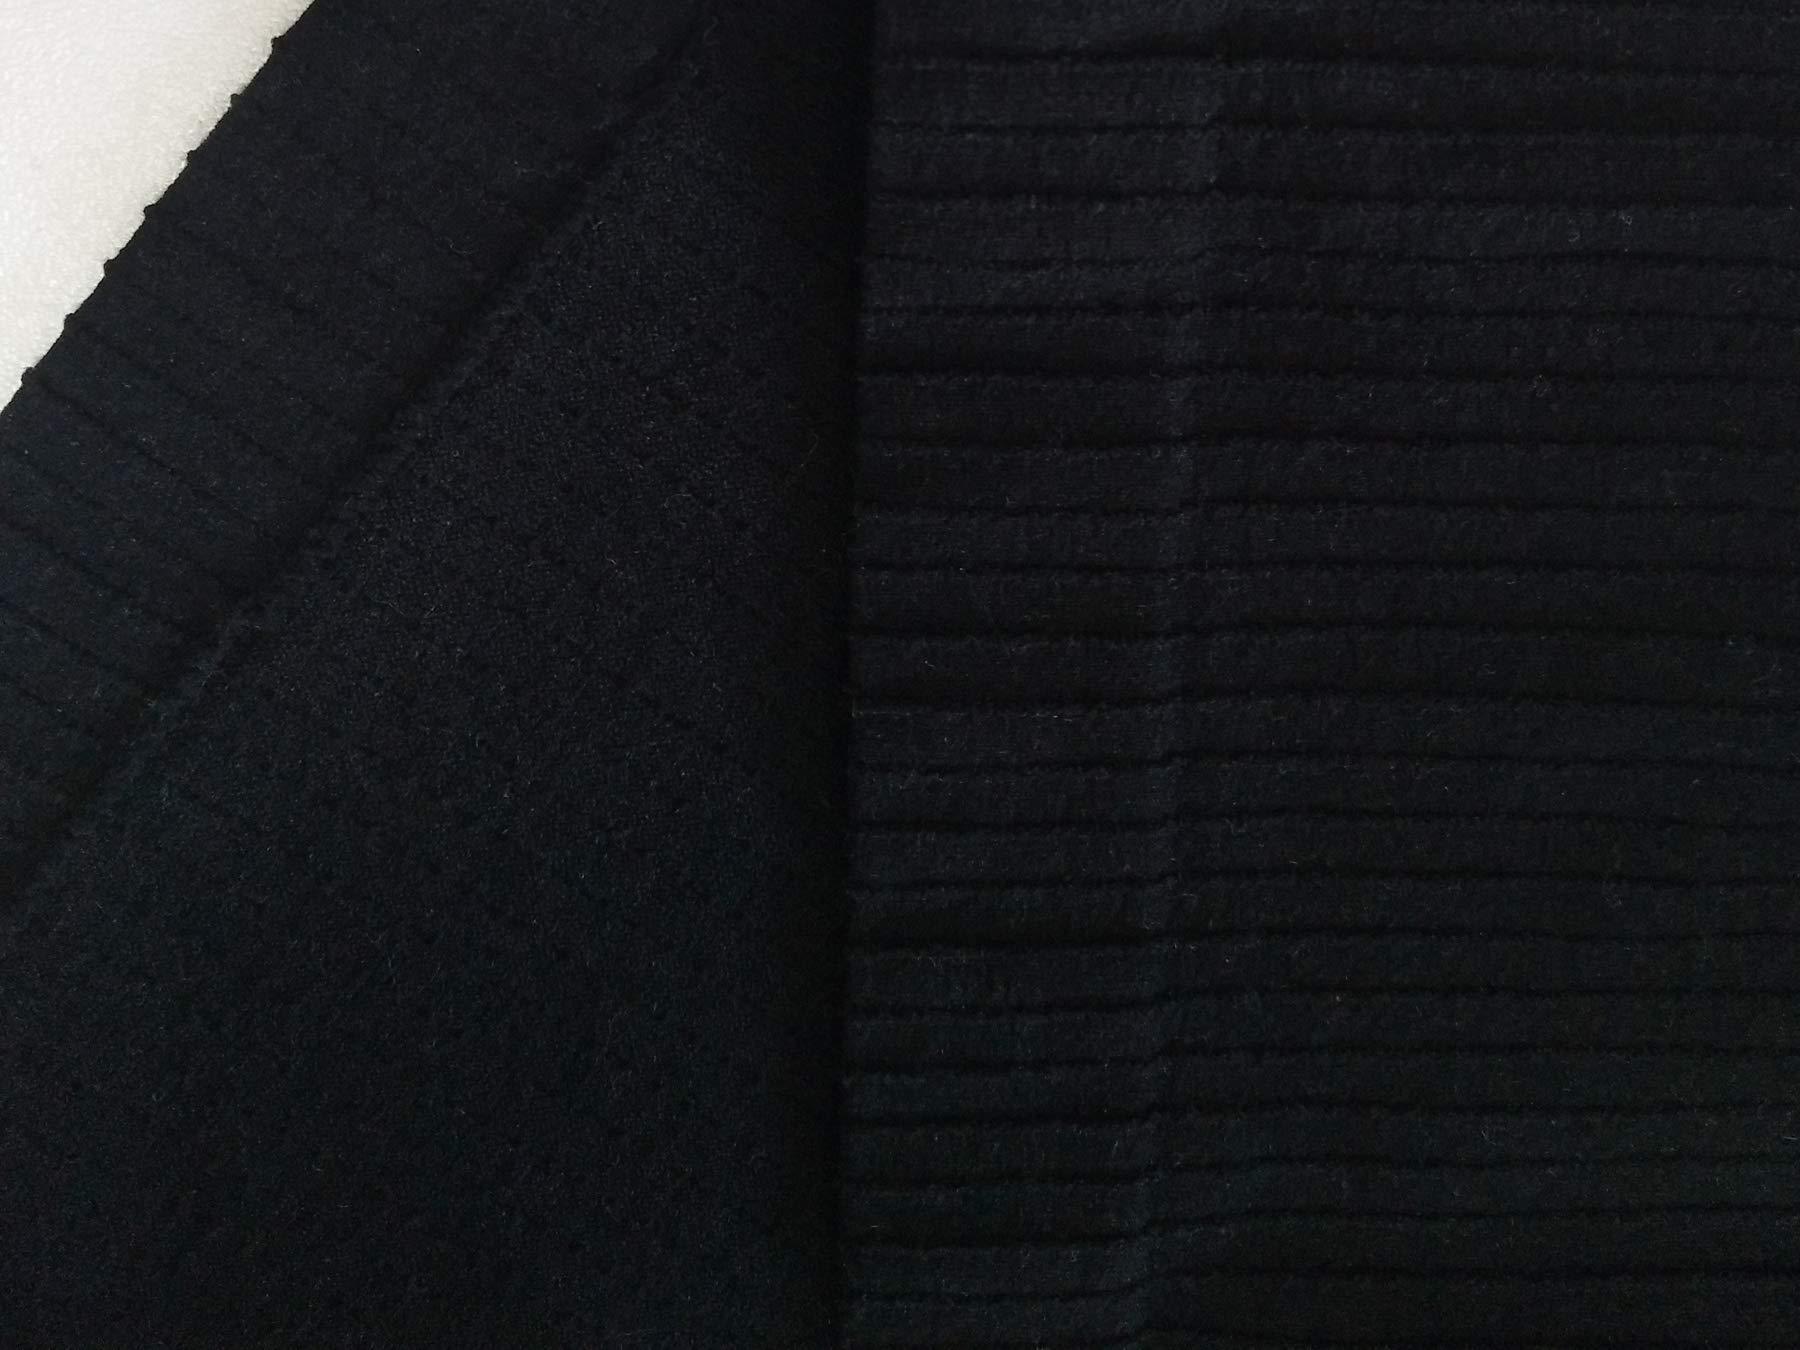 SPECIAL MAGIC Women\'s Seamless Rib Knit Mock Turtleneck Sleeveless Crop Top Black One Size